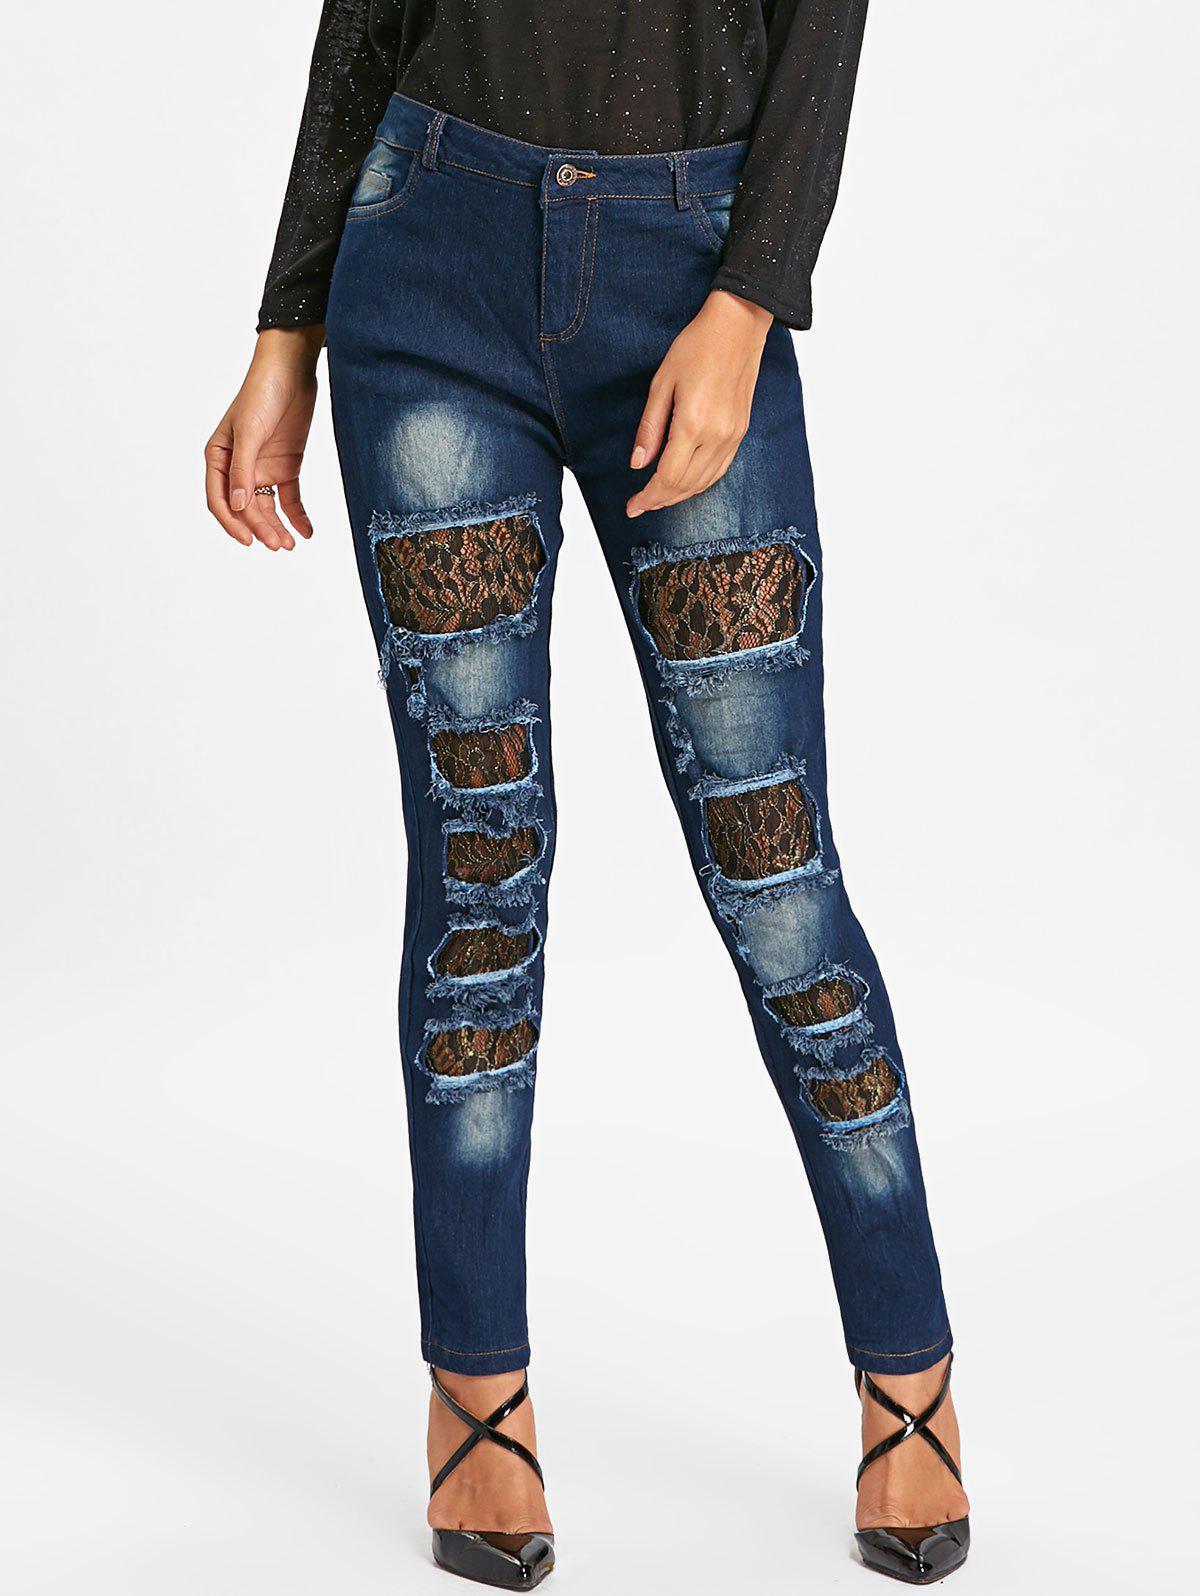 Lace Insert Distressed Denim Jeans 232874604